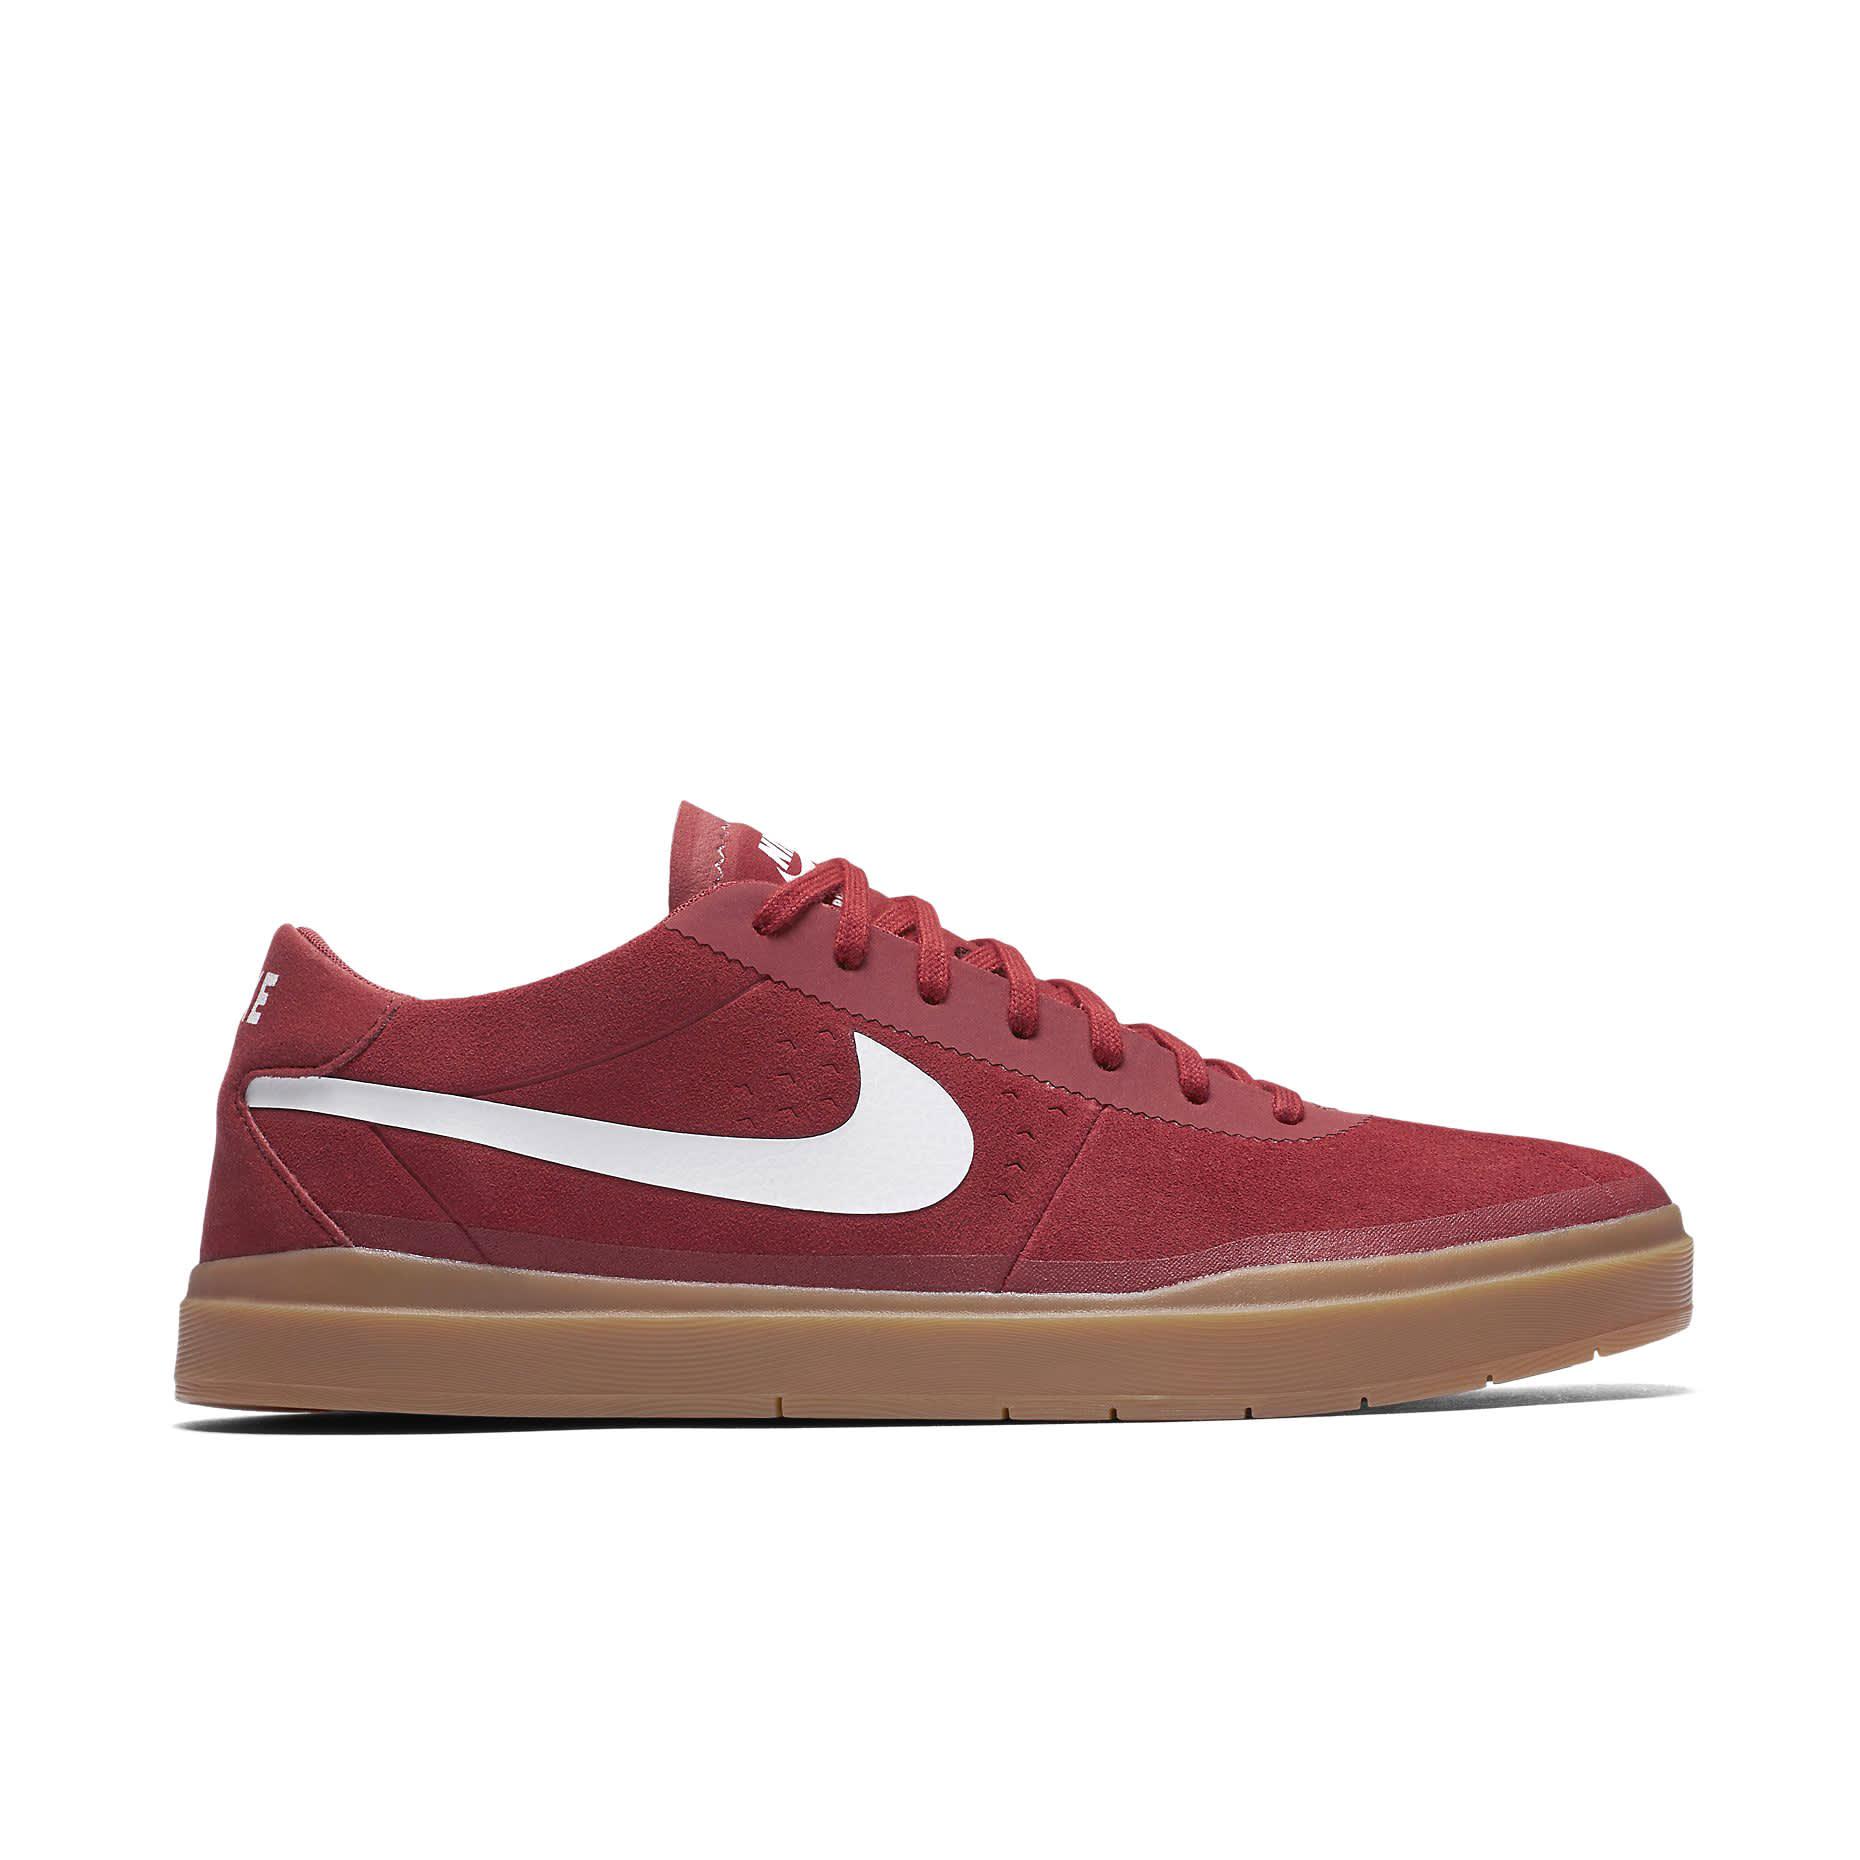 Skate shoes size 9 - Nike Bruin Sb Hyperfeel Skate Shoes